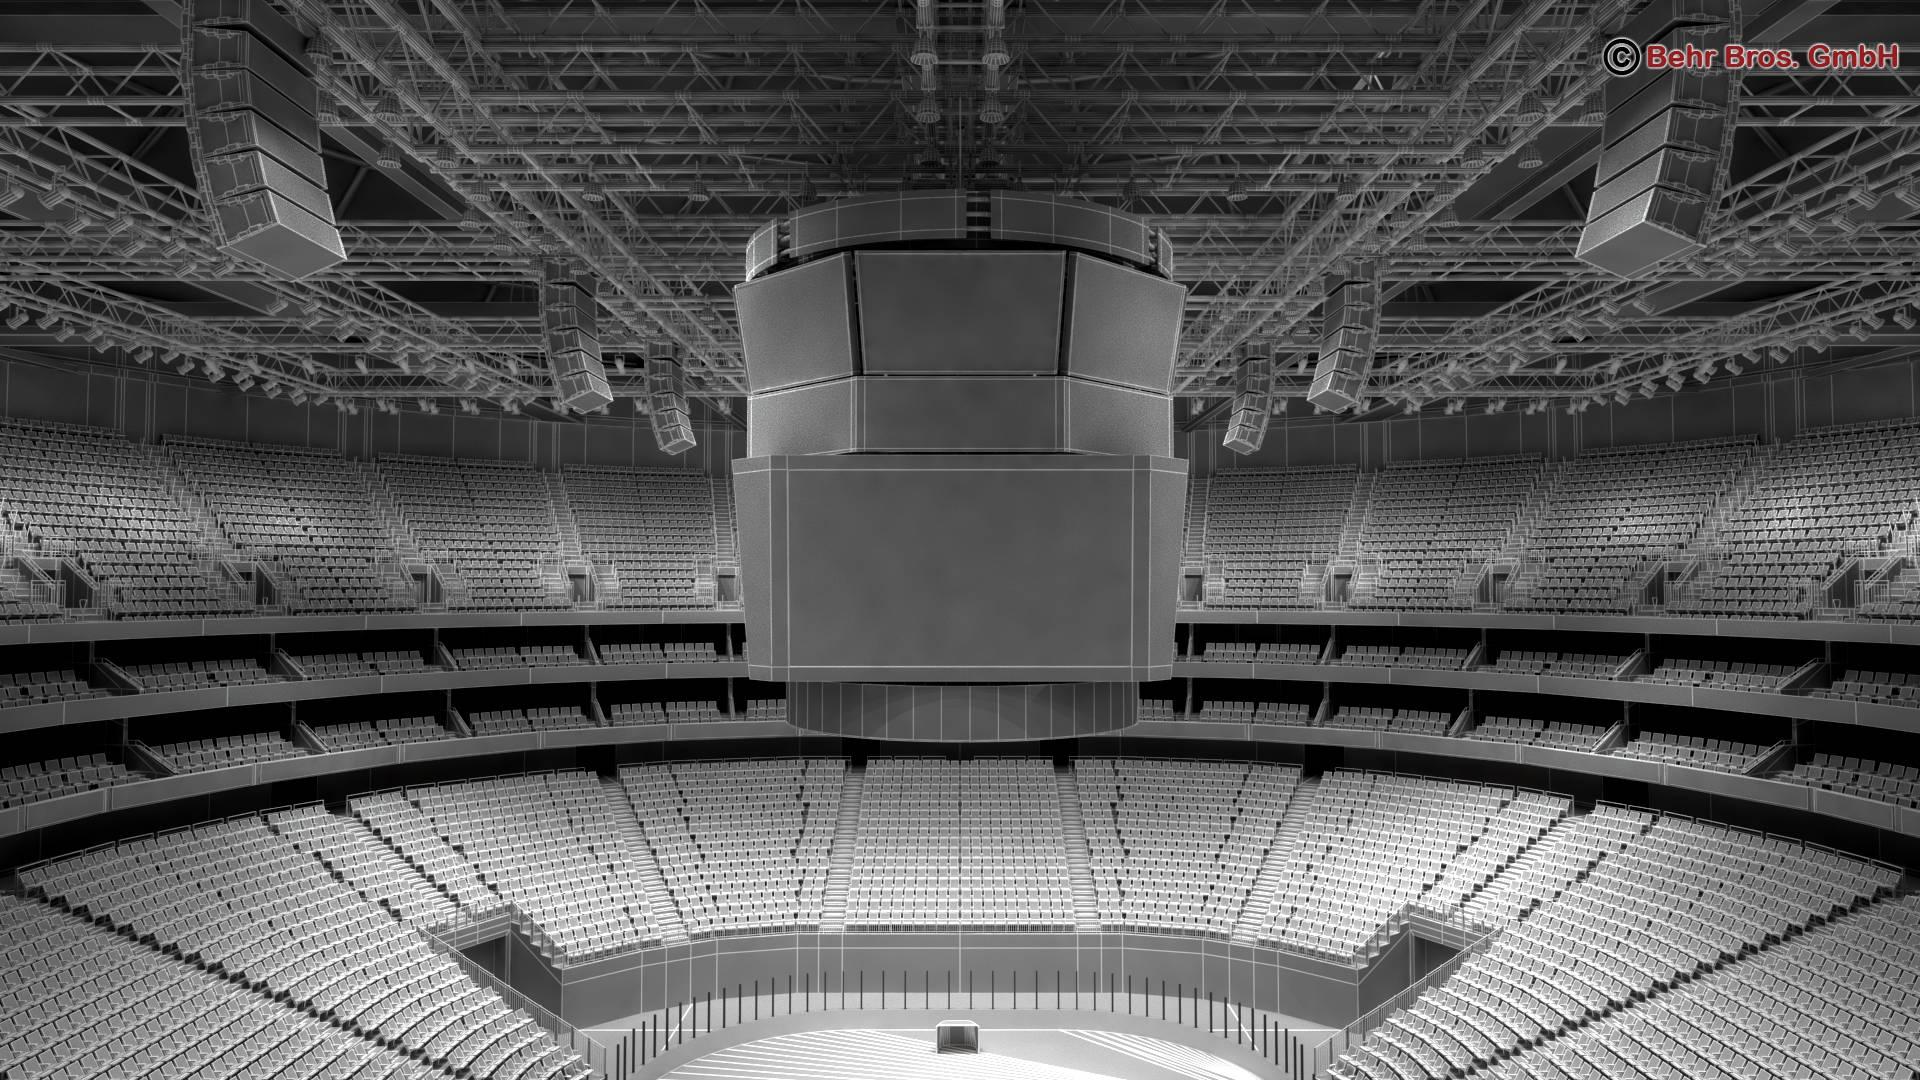 ice hockey arena v2 3d model 3ds max fbx c4d lwo ma mb obj 251663